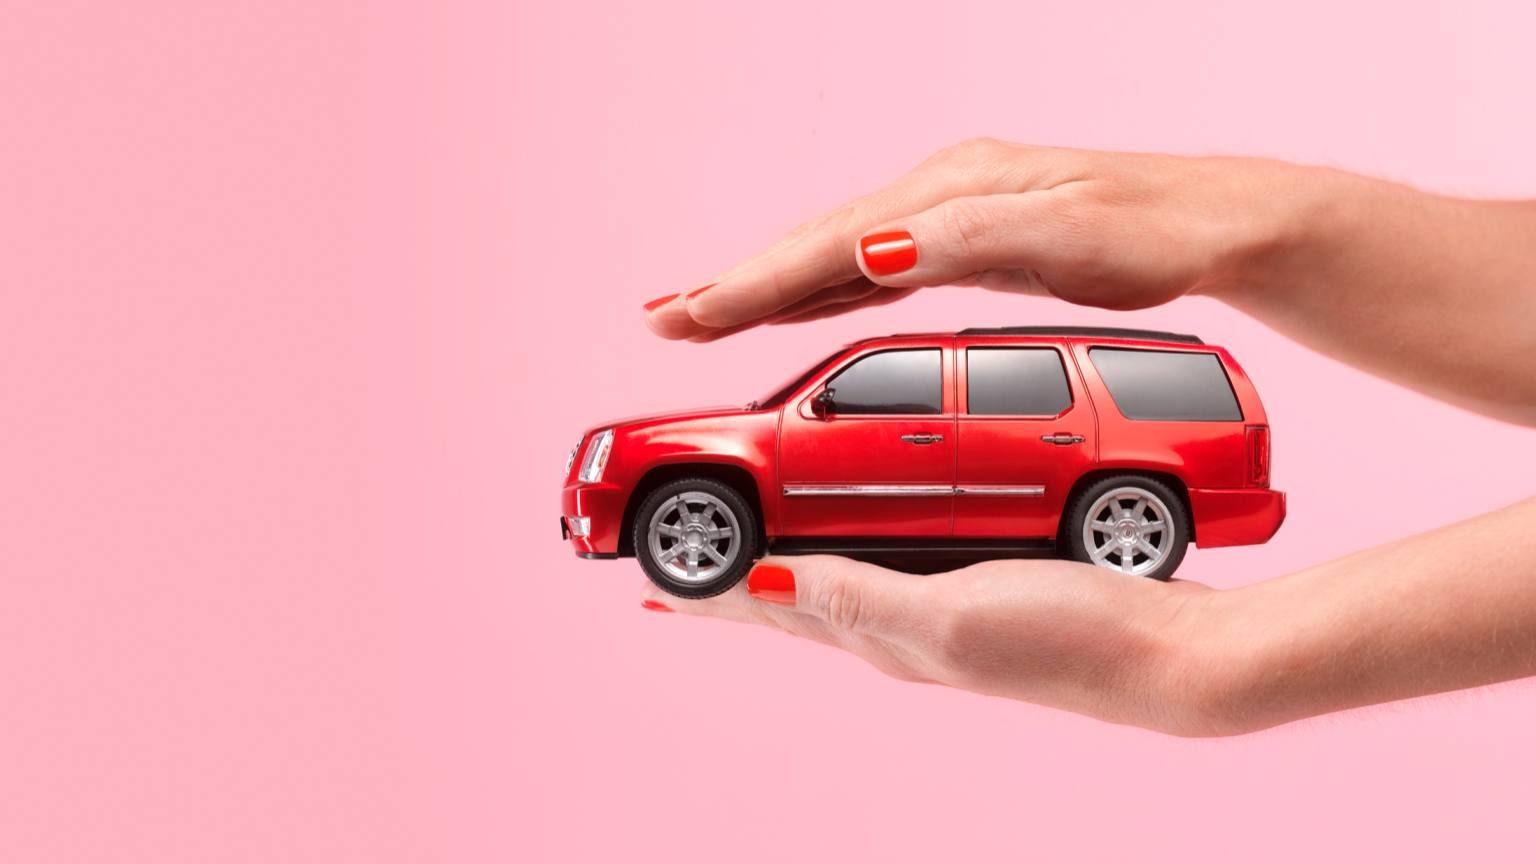 Car insurance masthead image